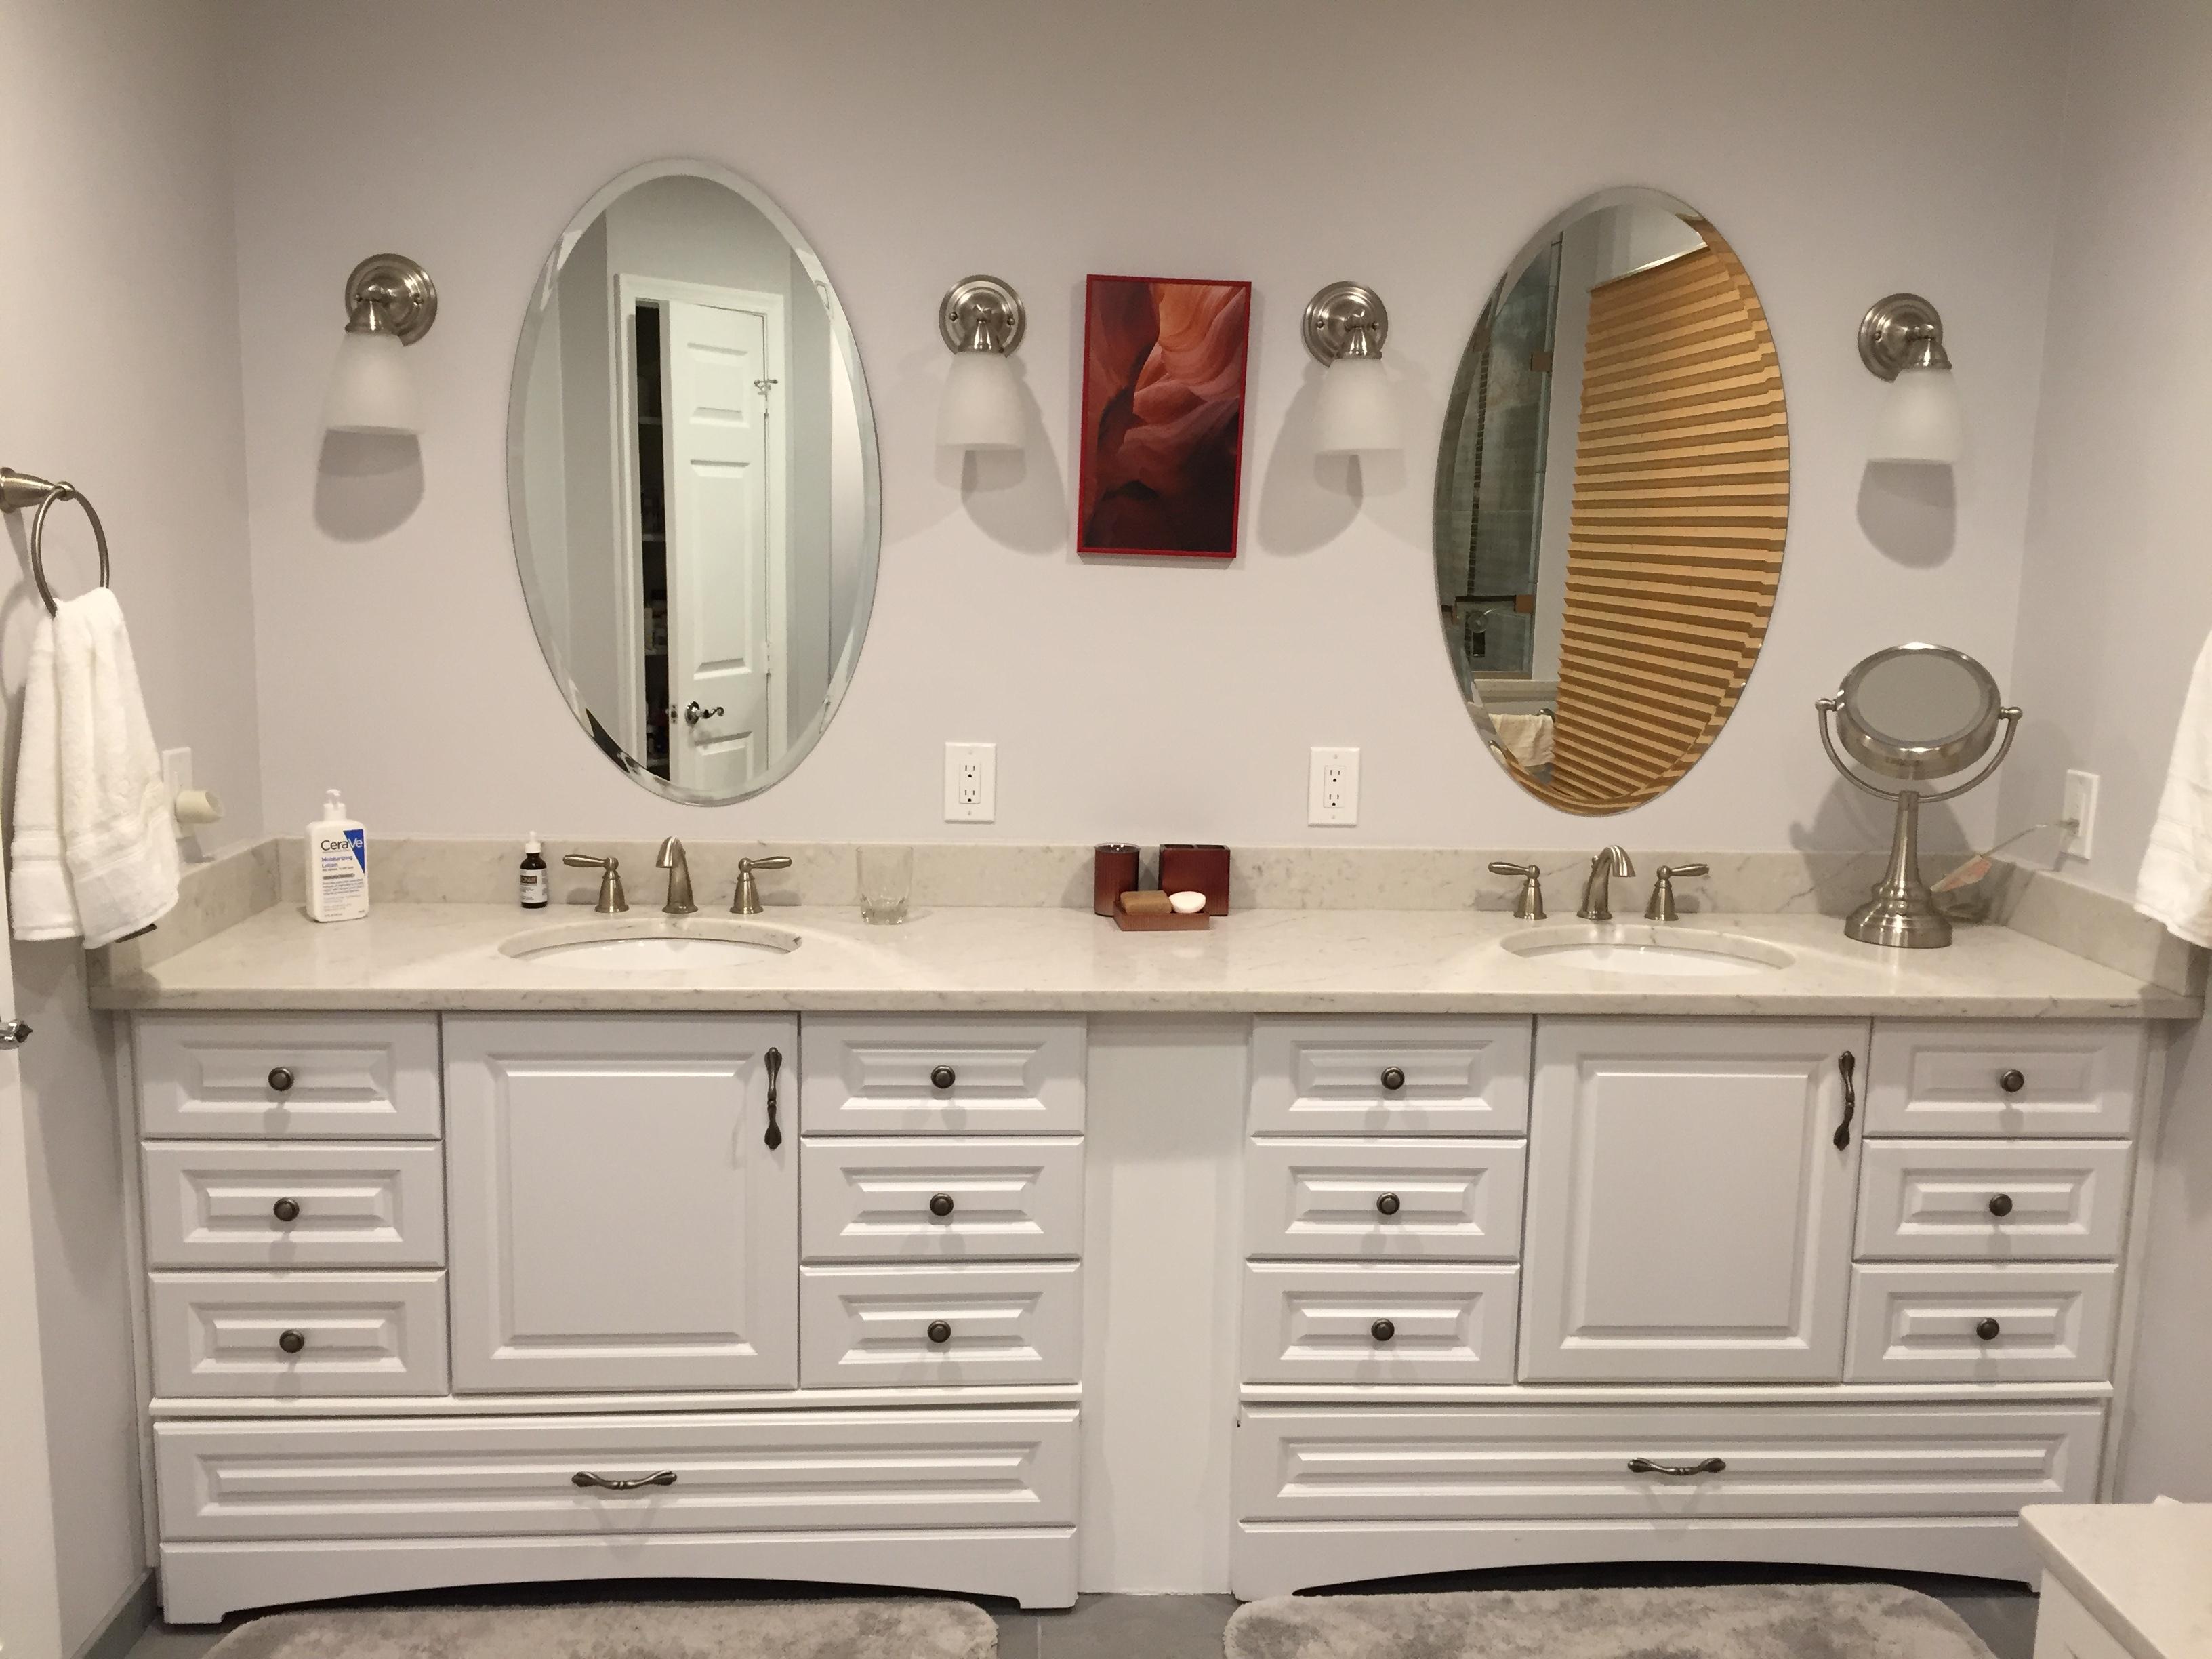 Best Kitchen Gallery: Ohi Design Custom Bathroom Remodel Ohi Design of Designing A Bathroom Remodel  on rachelxblog.com